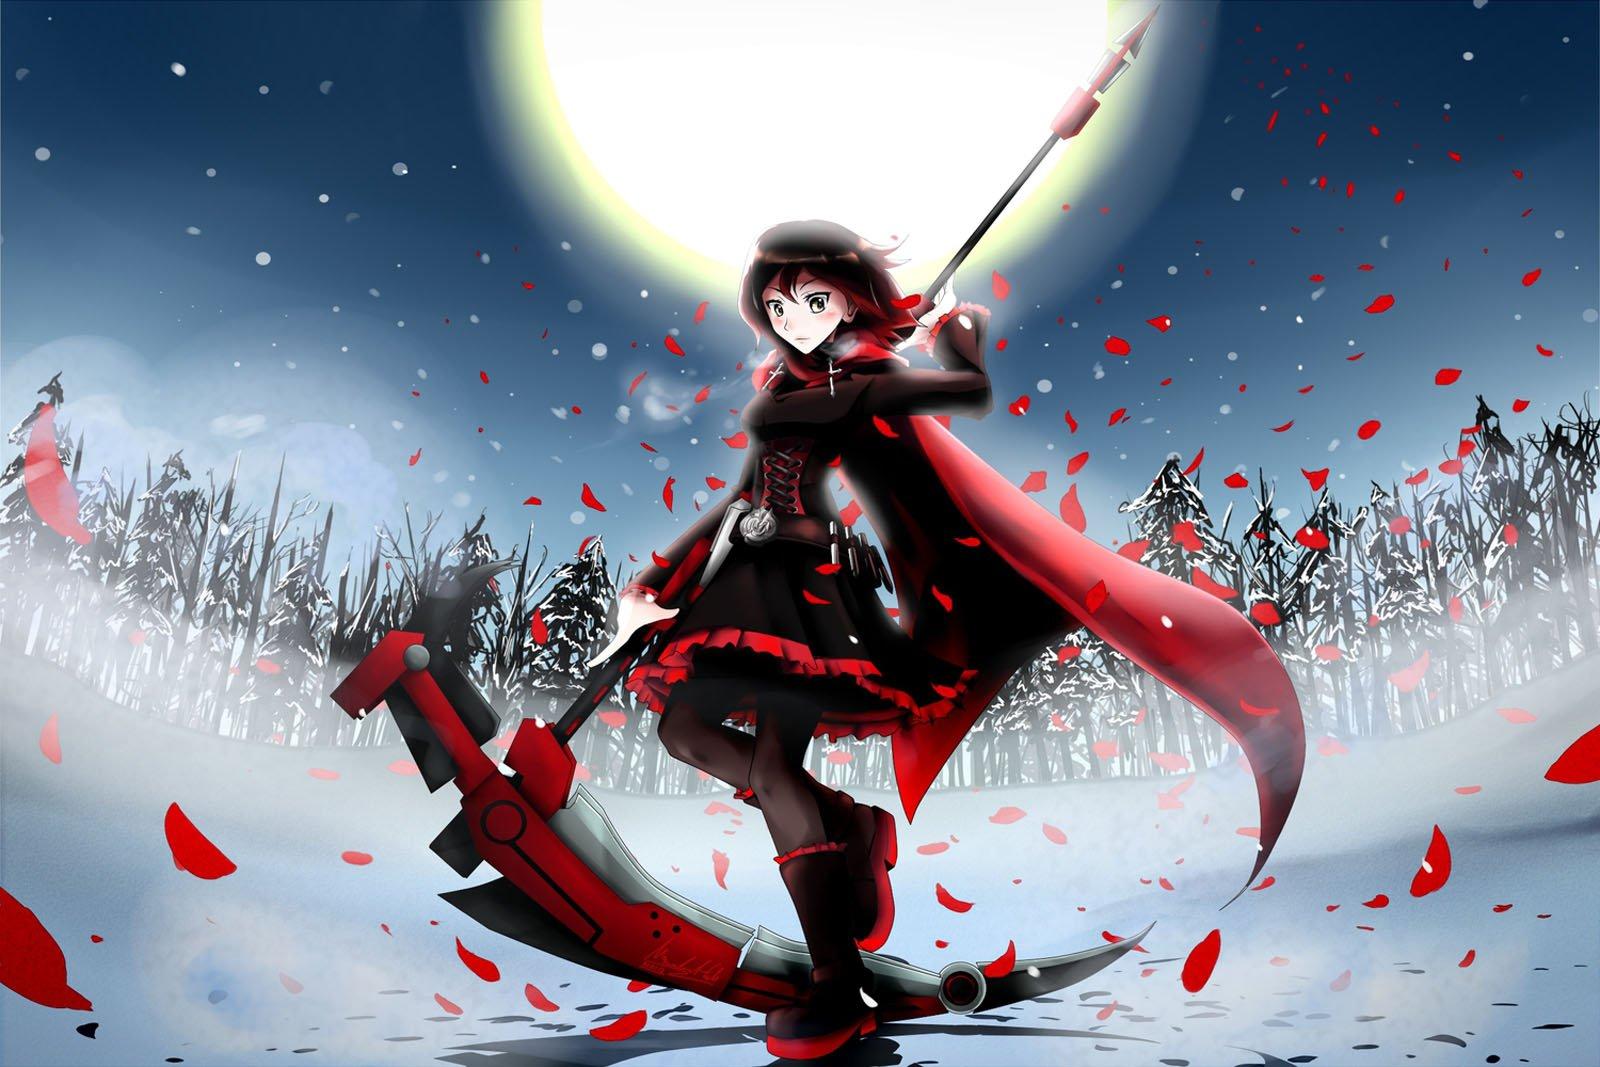 Ruby Rose Red RWBY Death Scythe Full Moon Anime HD Wallpaper Desktop 1600x1067